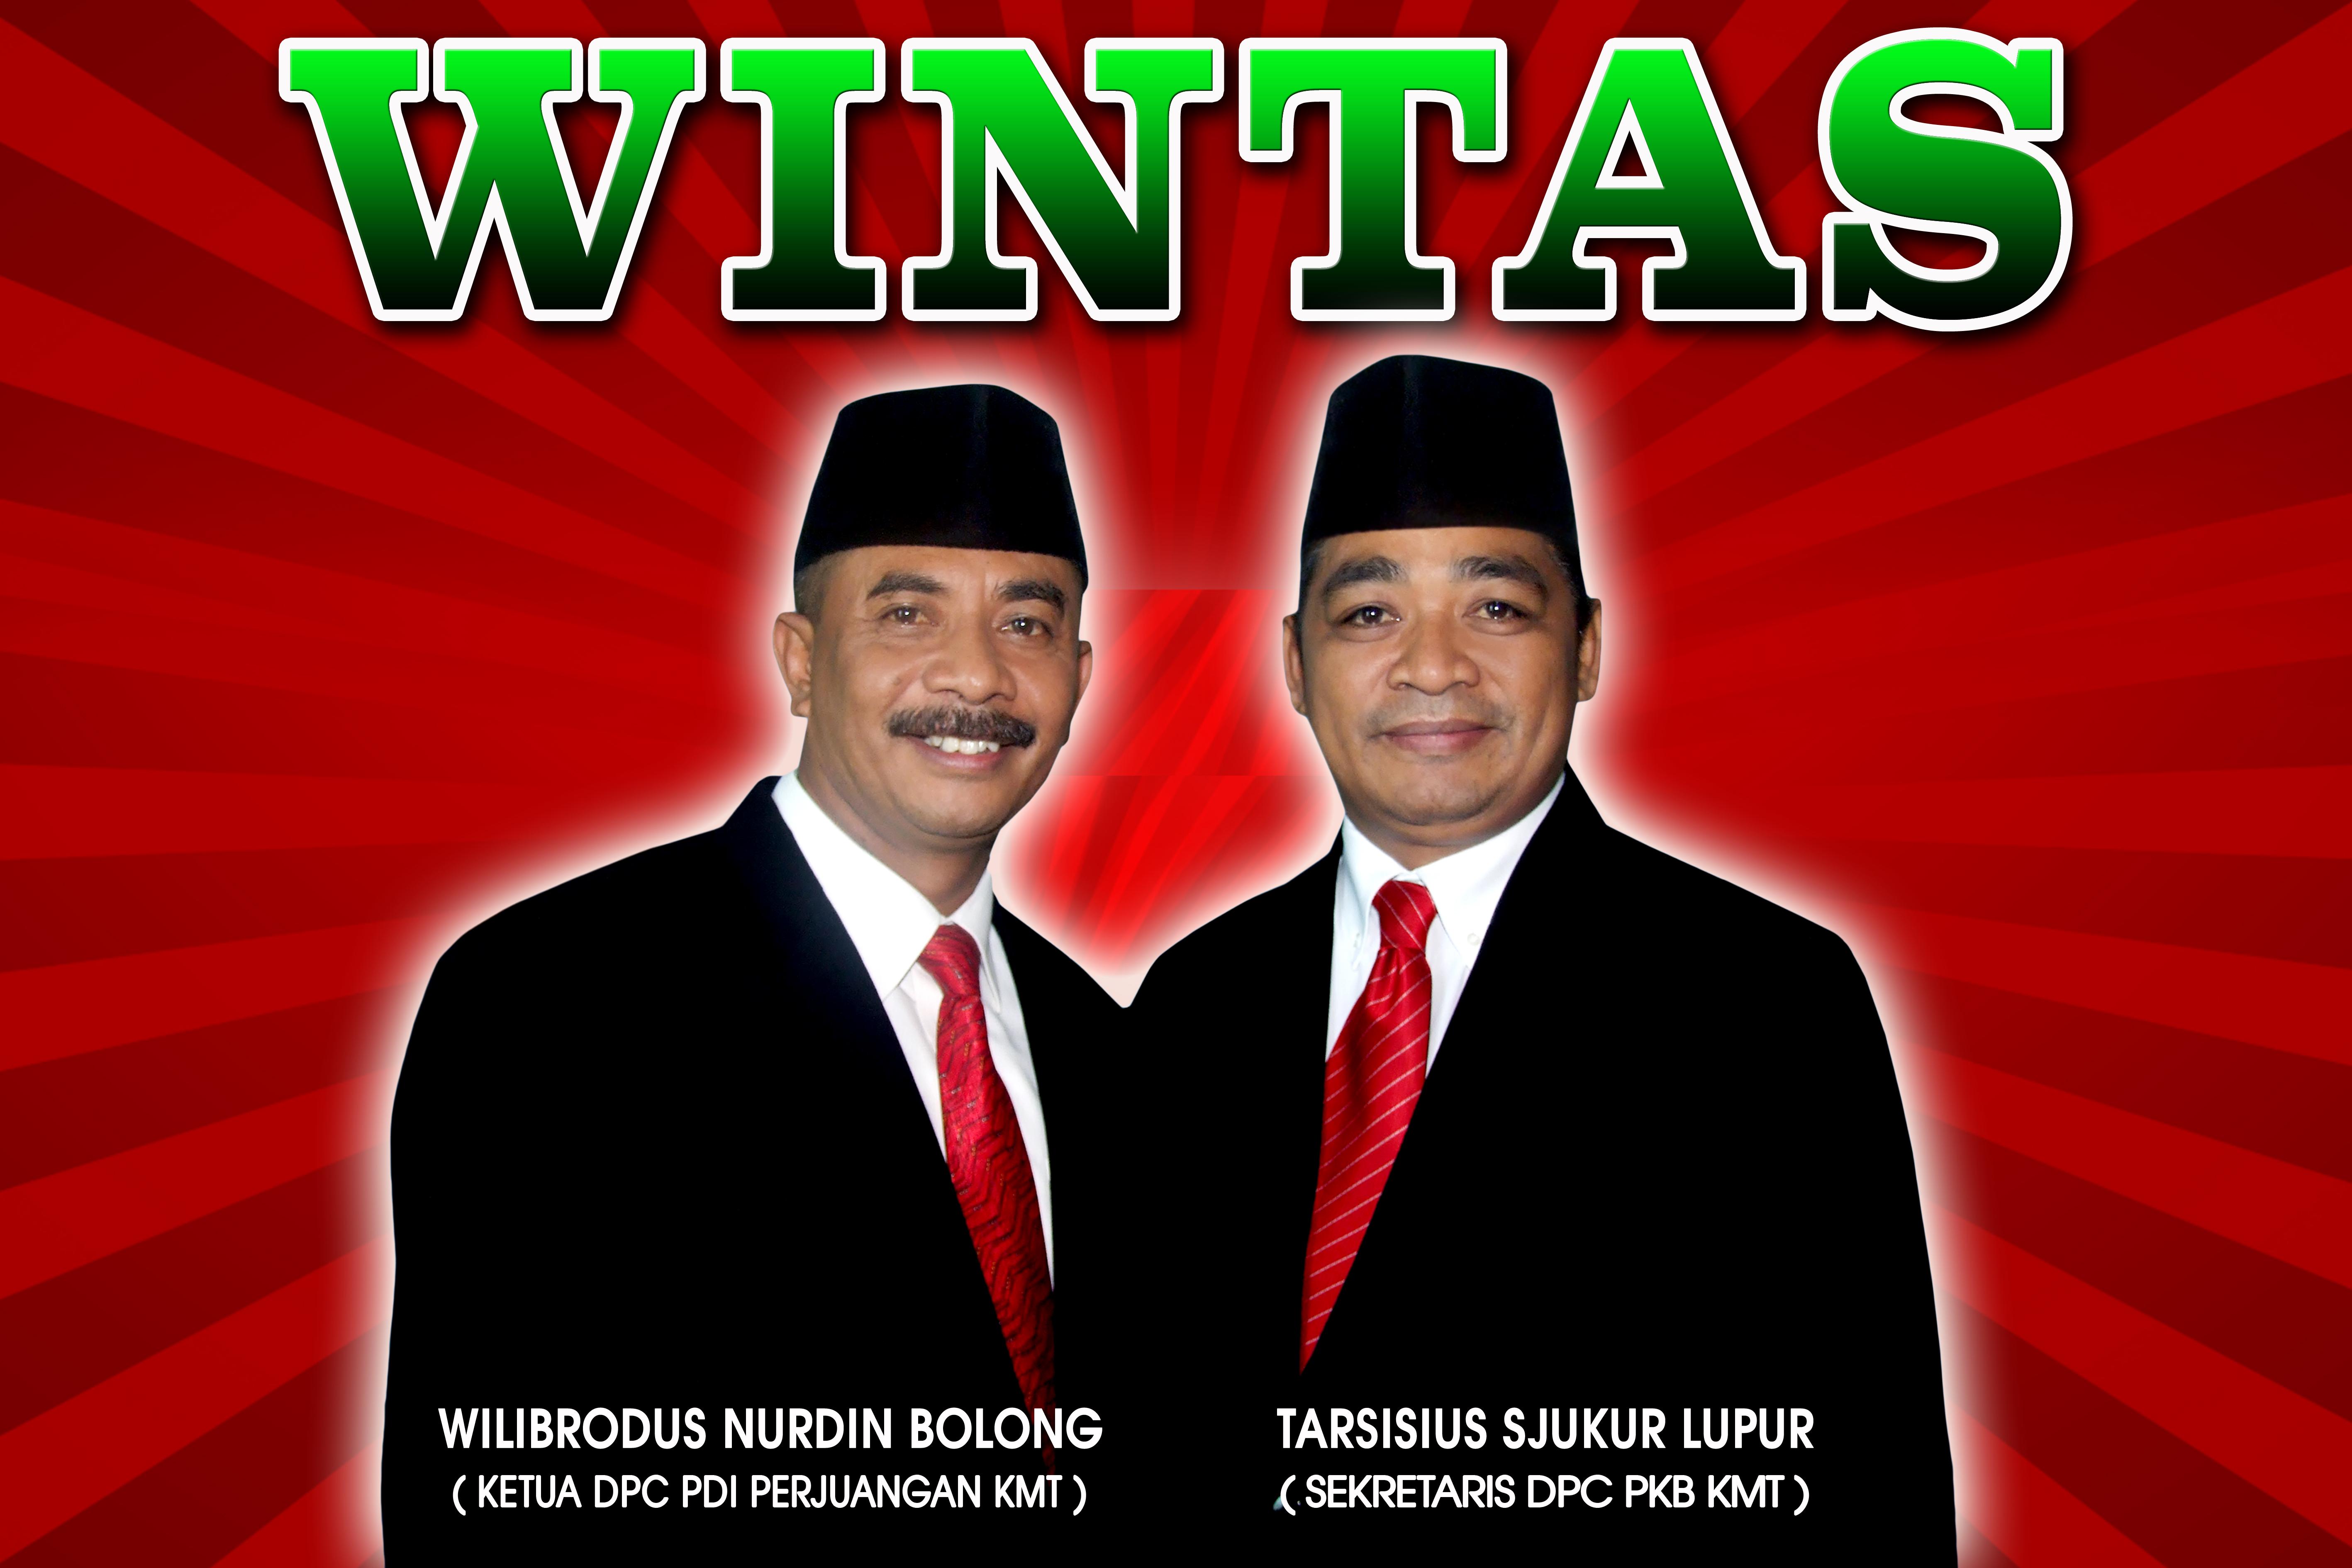 Wili Nurdin ; Wintas Tetap Solid,Tarsi Syukur Berkaca Pada pilkada 2013